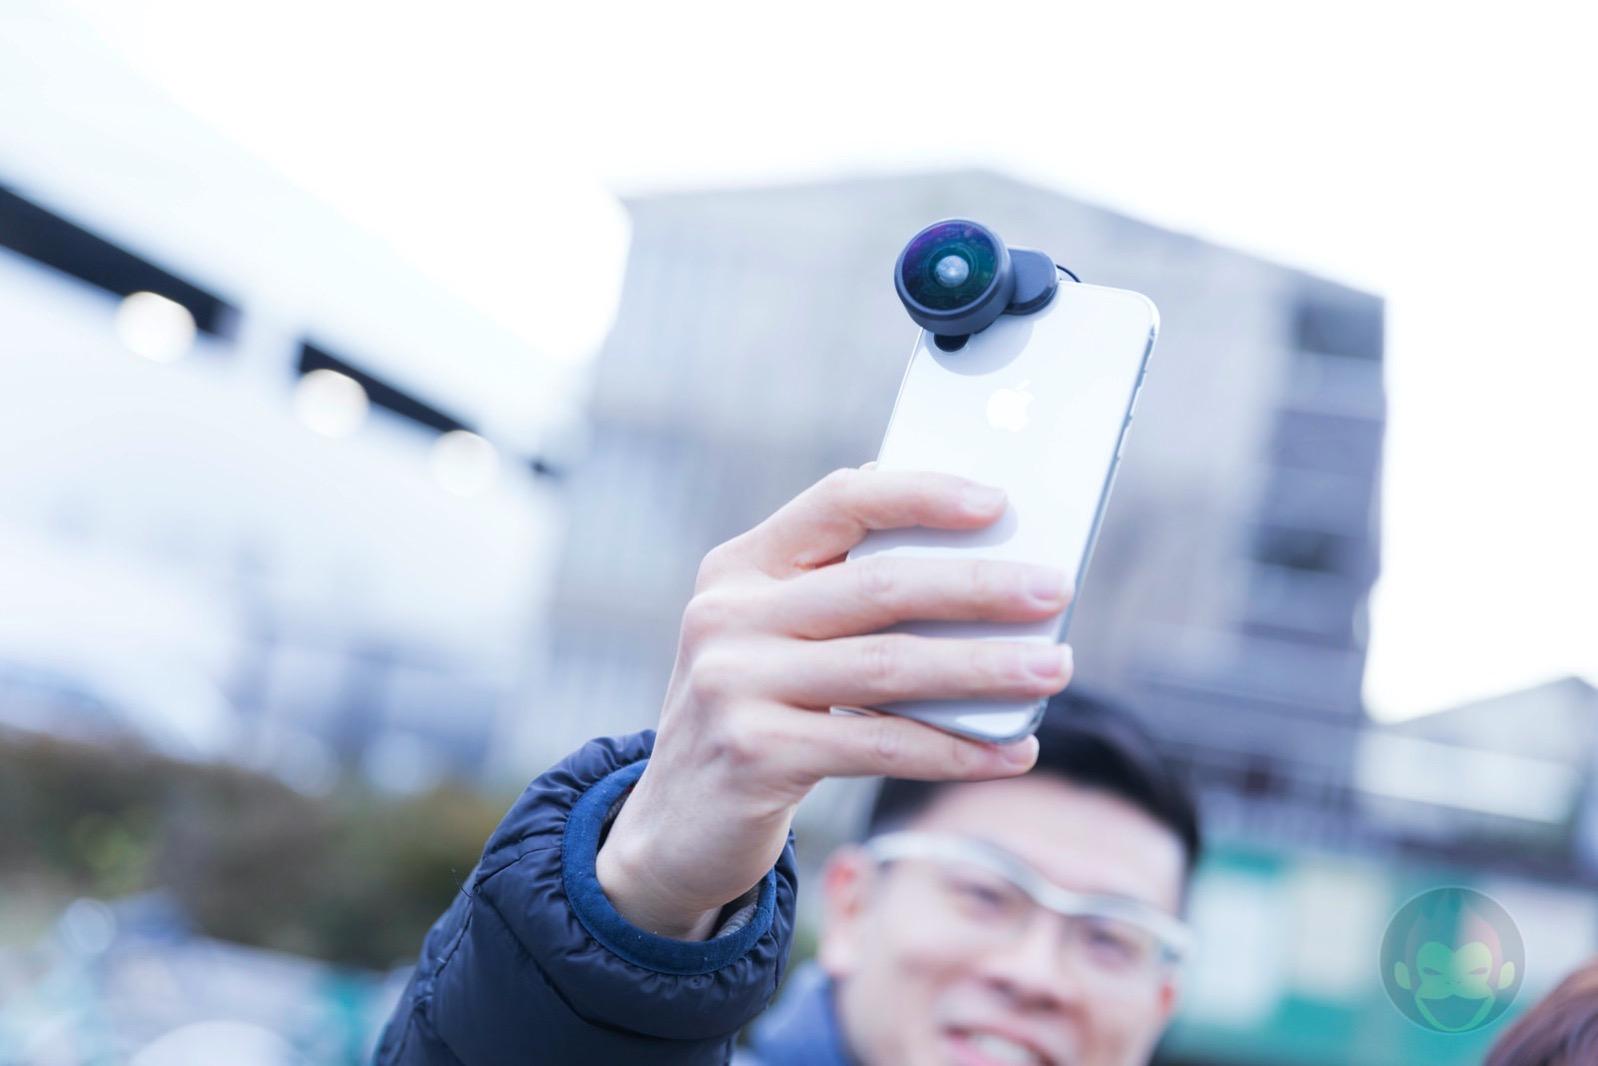 Fusion-Lens-360-iPhone-Camera-02.jpg